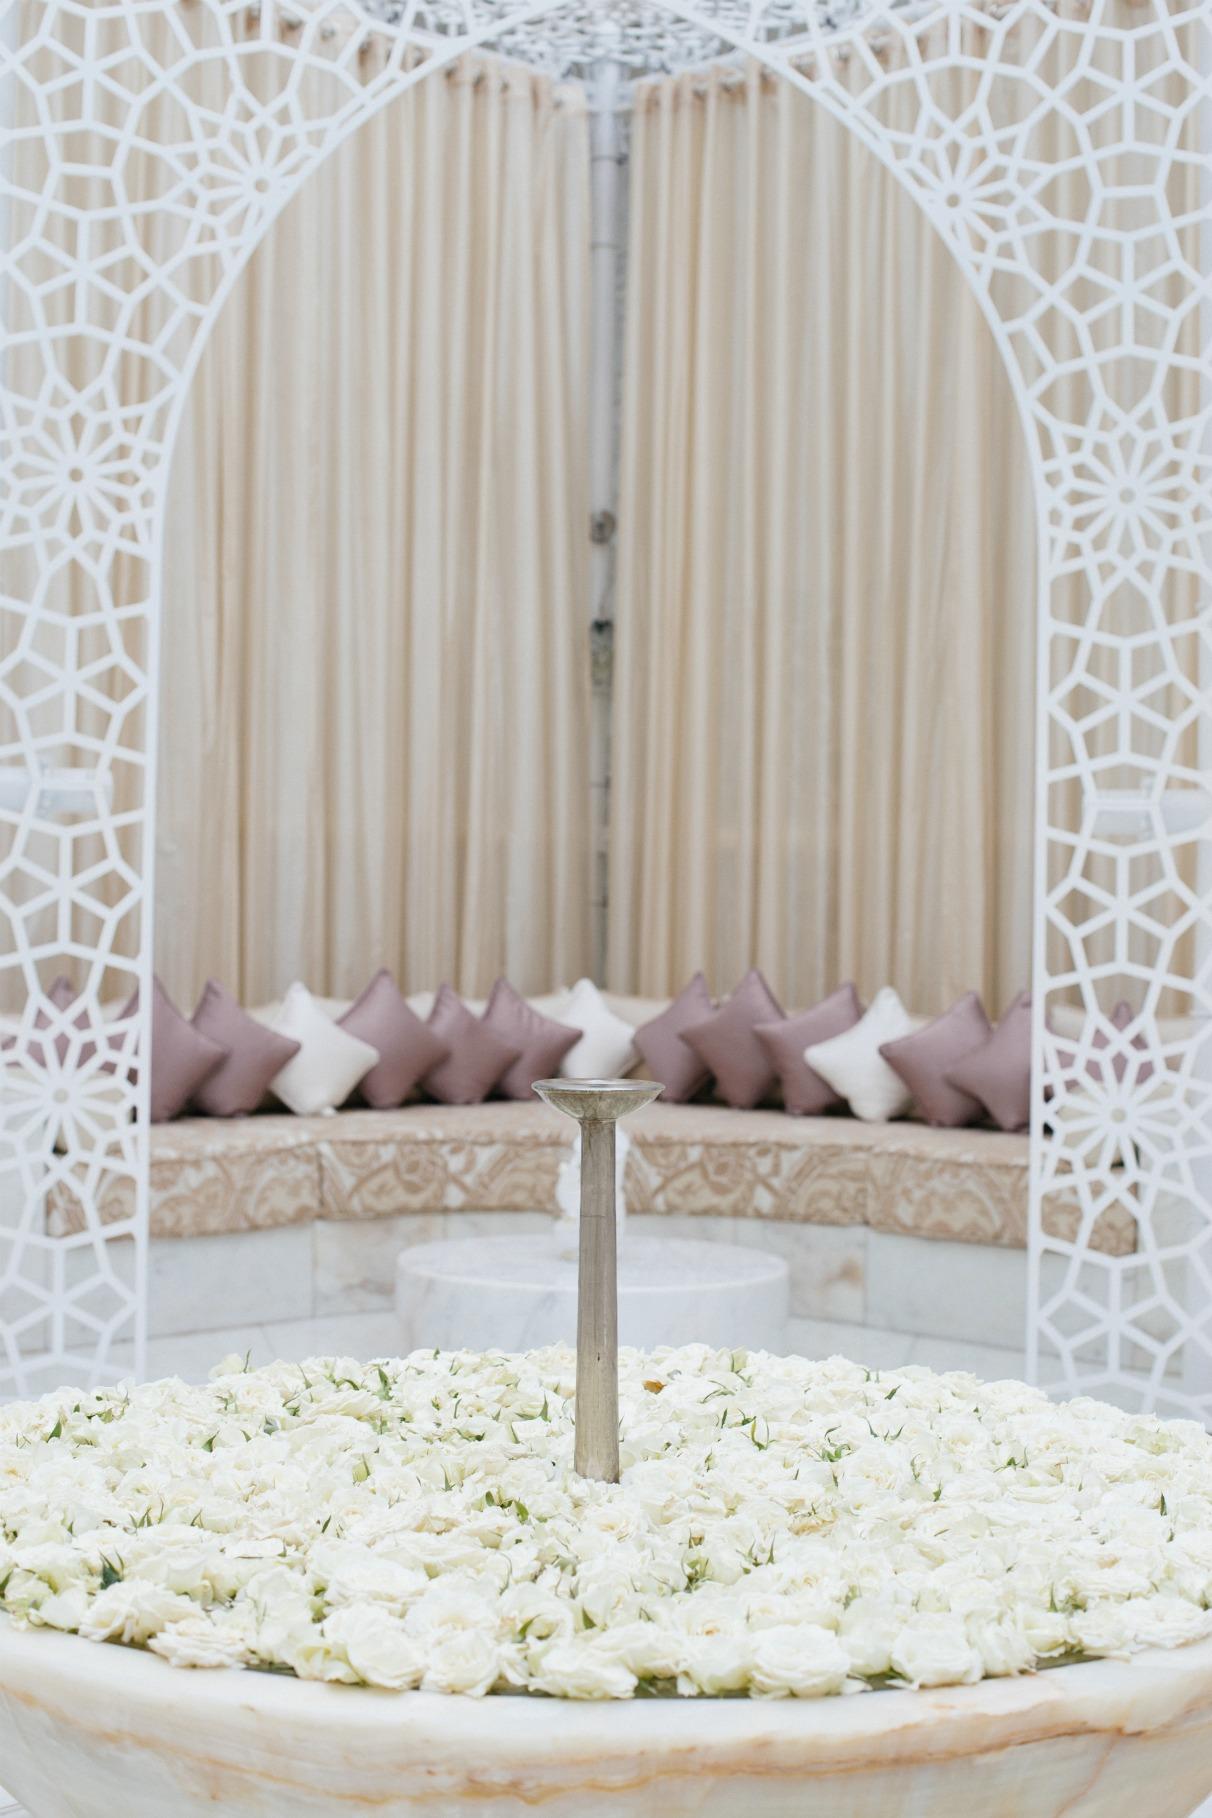 royal-mansour-hotel-luxury-marrakesch-marrakesh-morocco-edisa-shahini-disicouture-blog-029930k